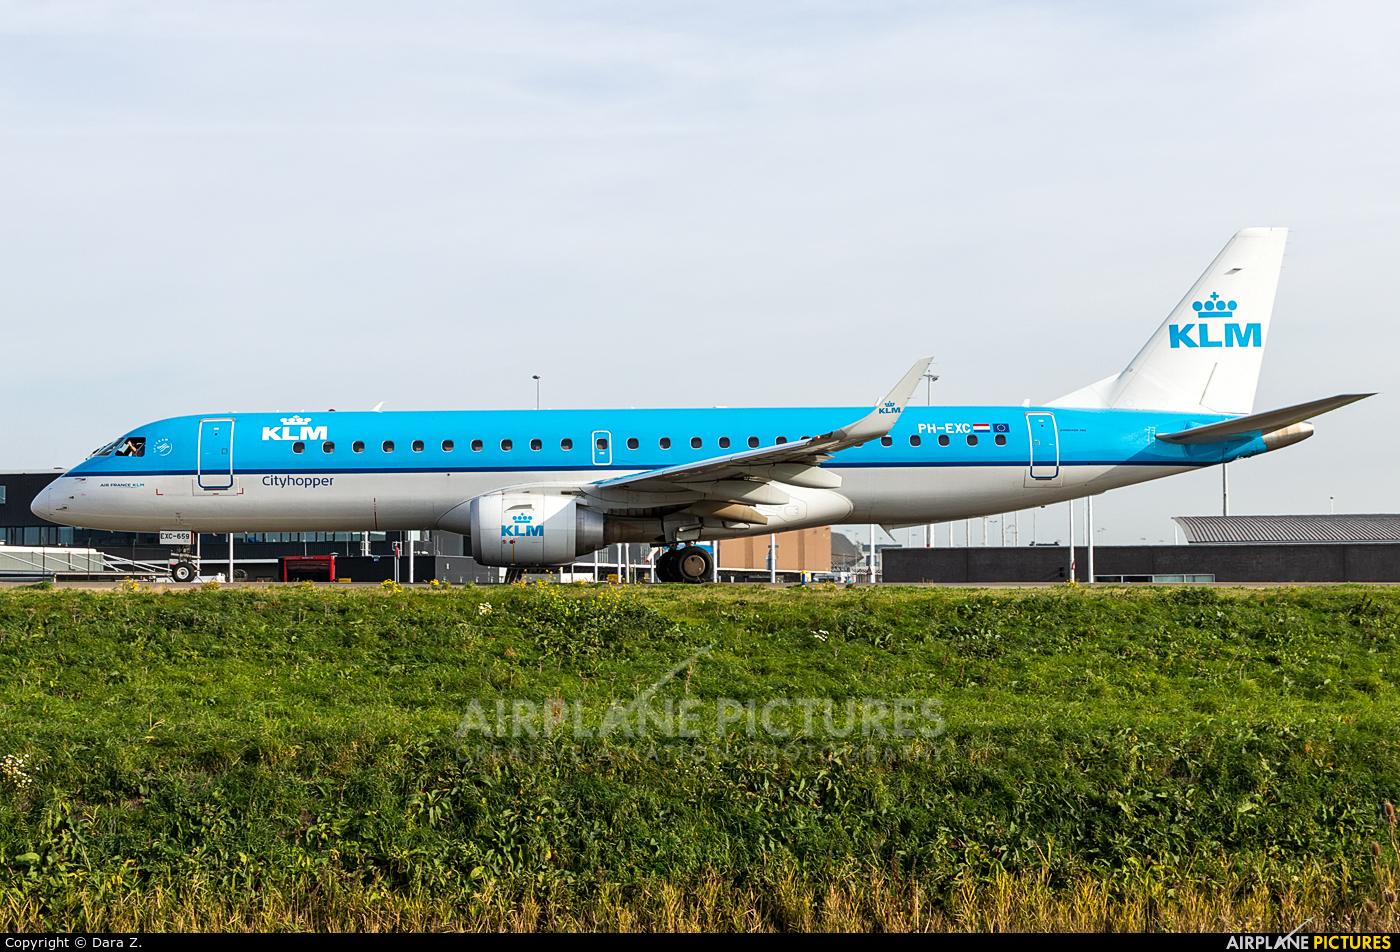 KLM Cityhopper PH-EXC aircraft at Amsterdam - Schiphol